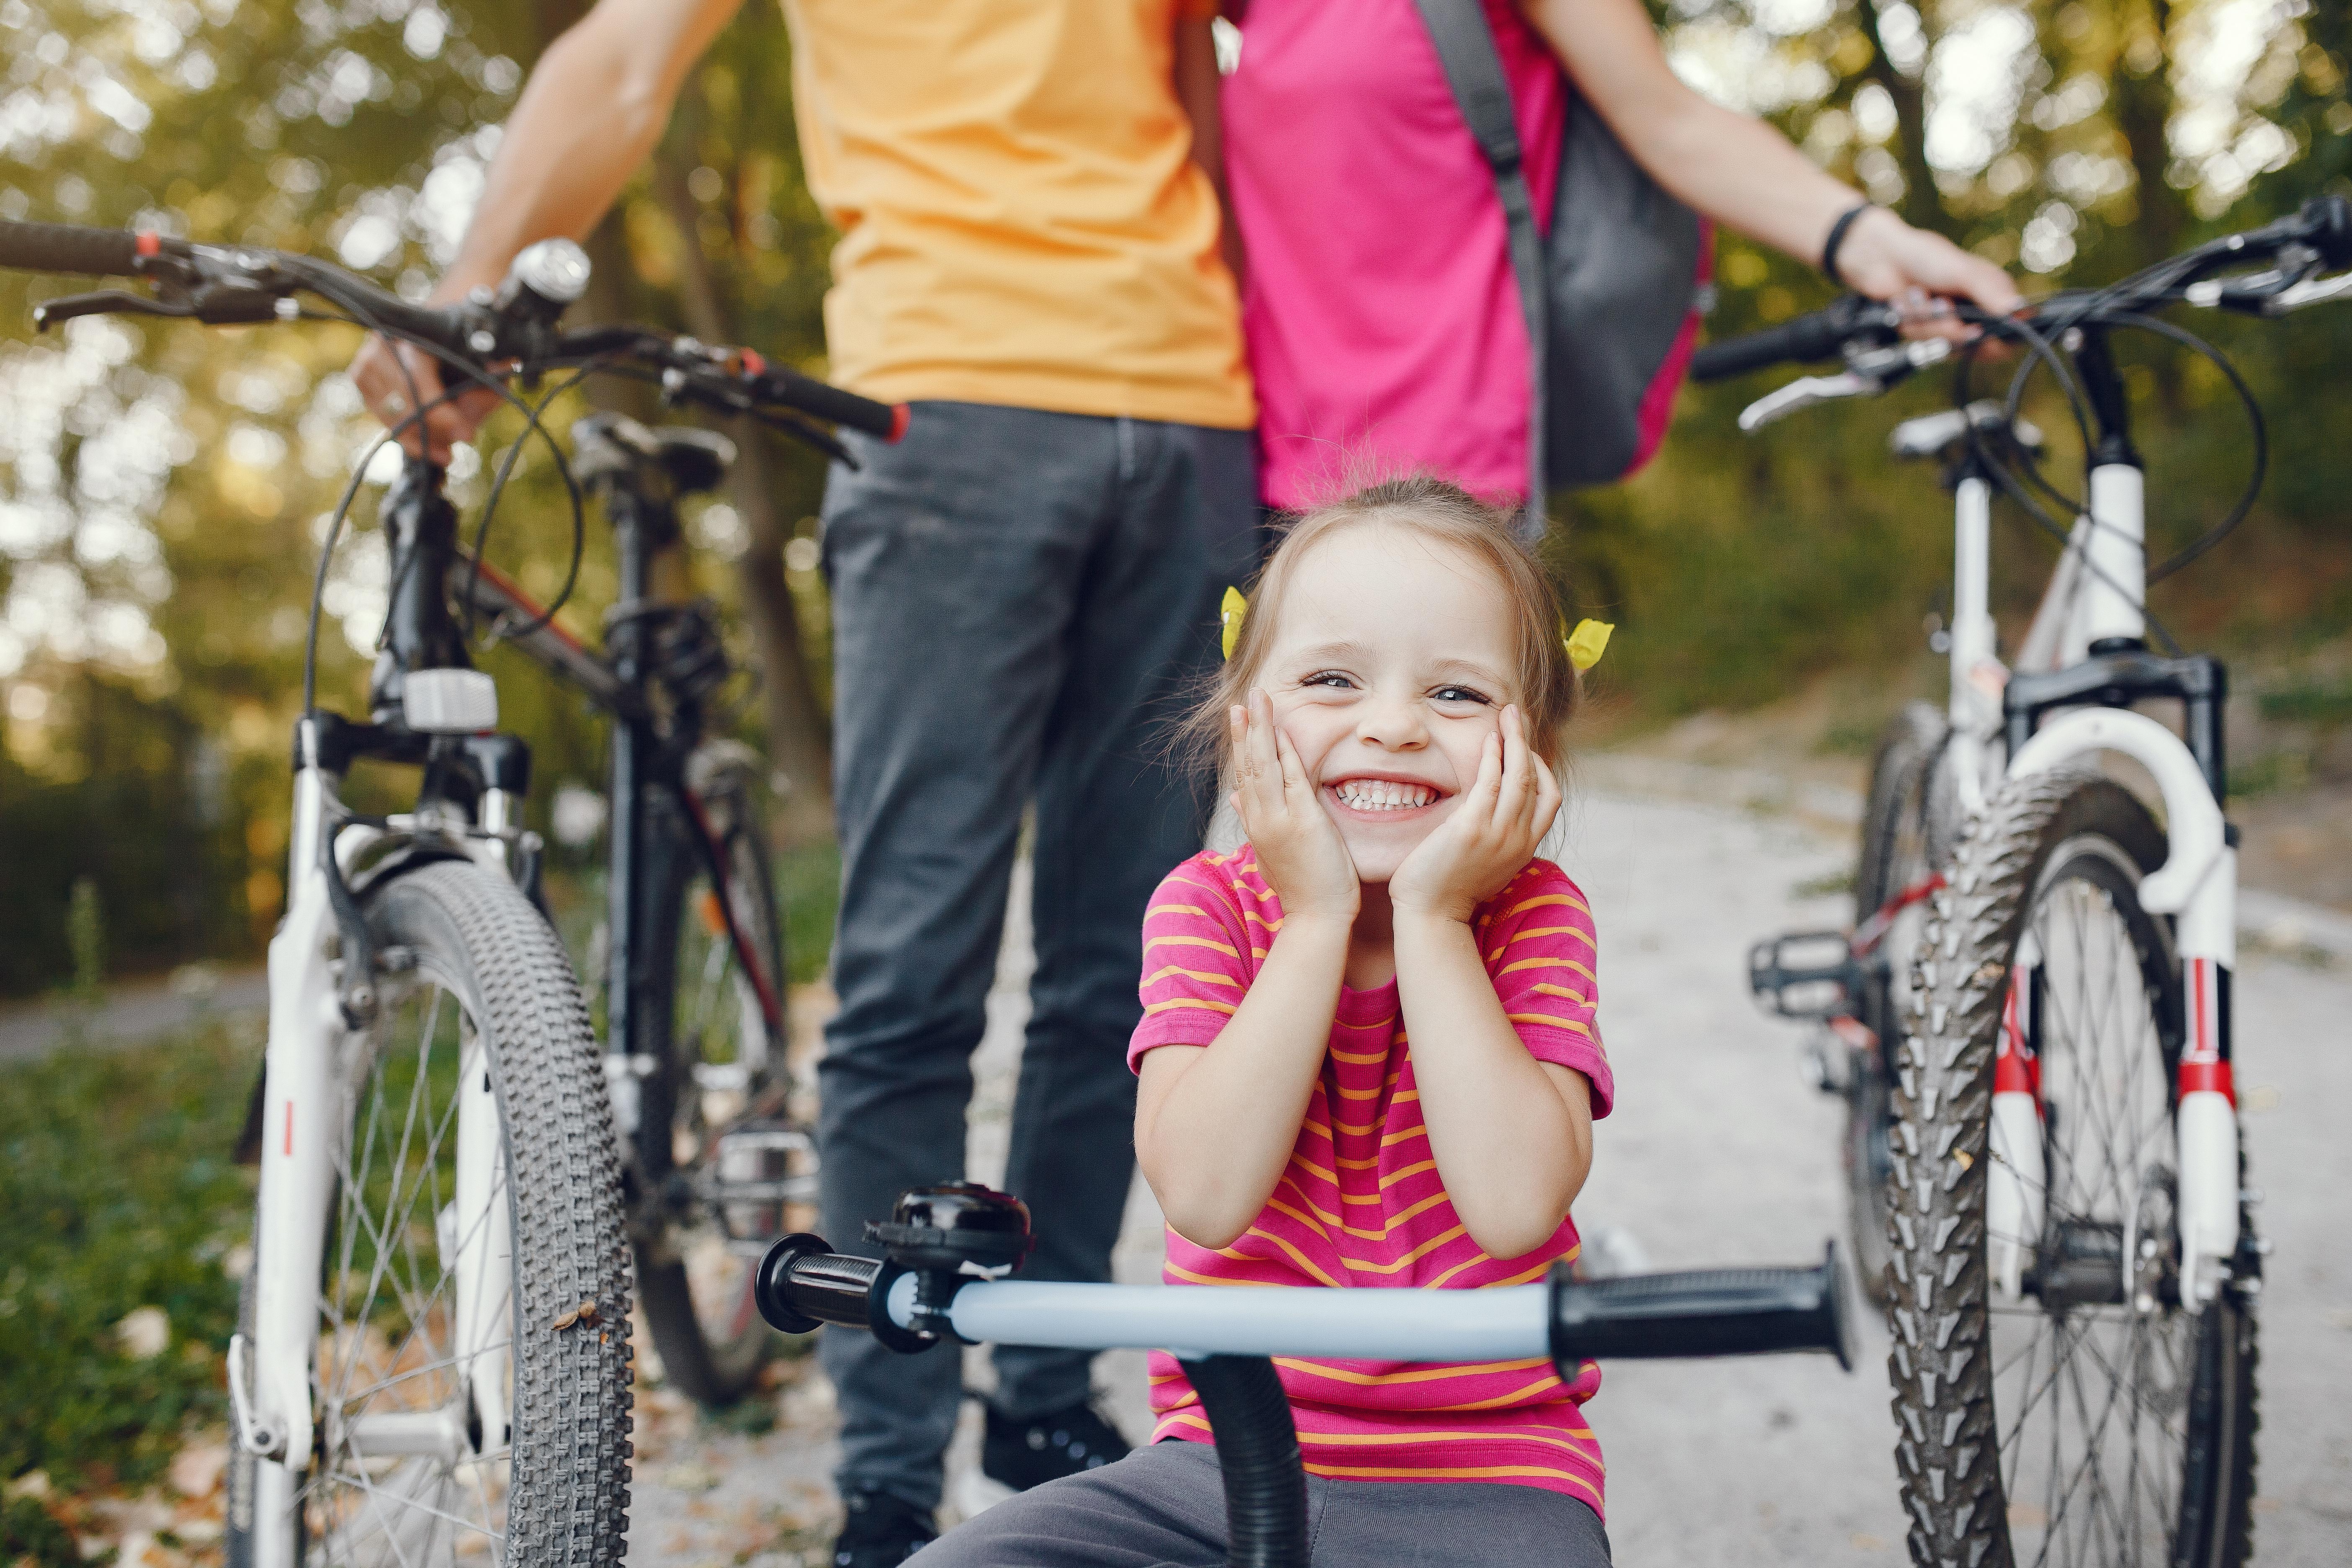 Ghid achizitie bicicleta copii: Cum sa aleg bicicleta potrivita pentru copilul meu?